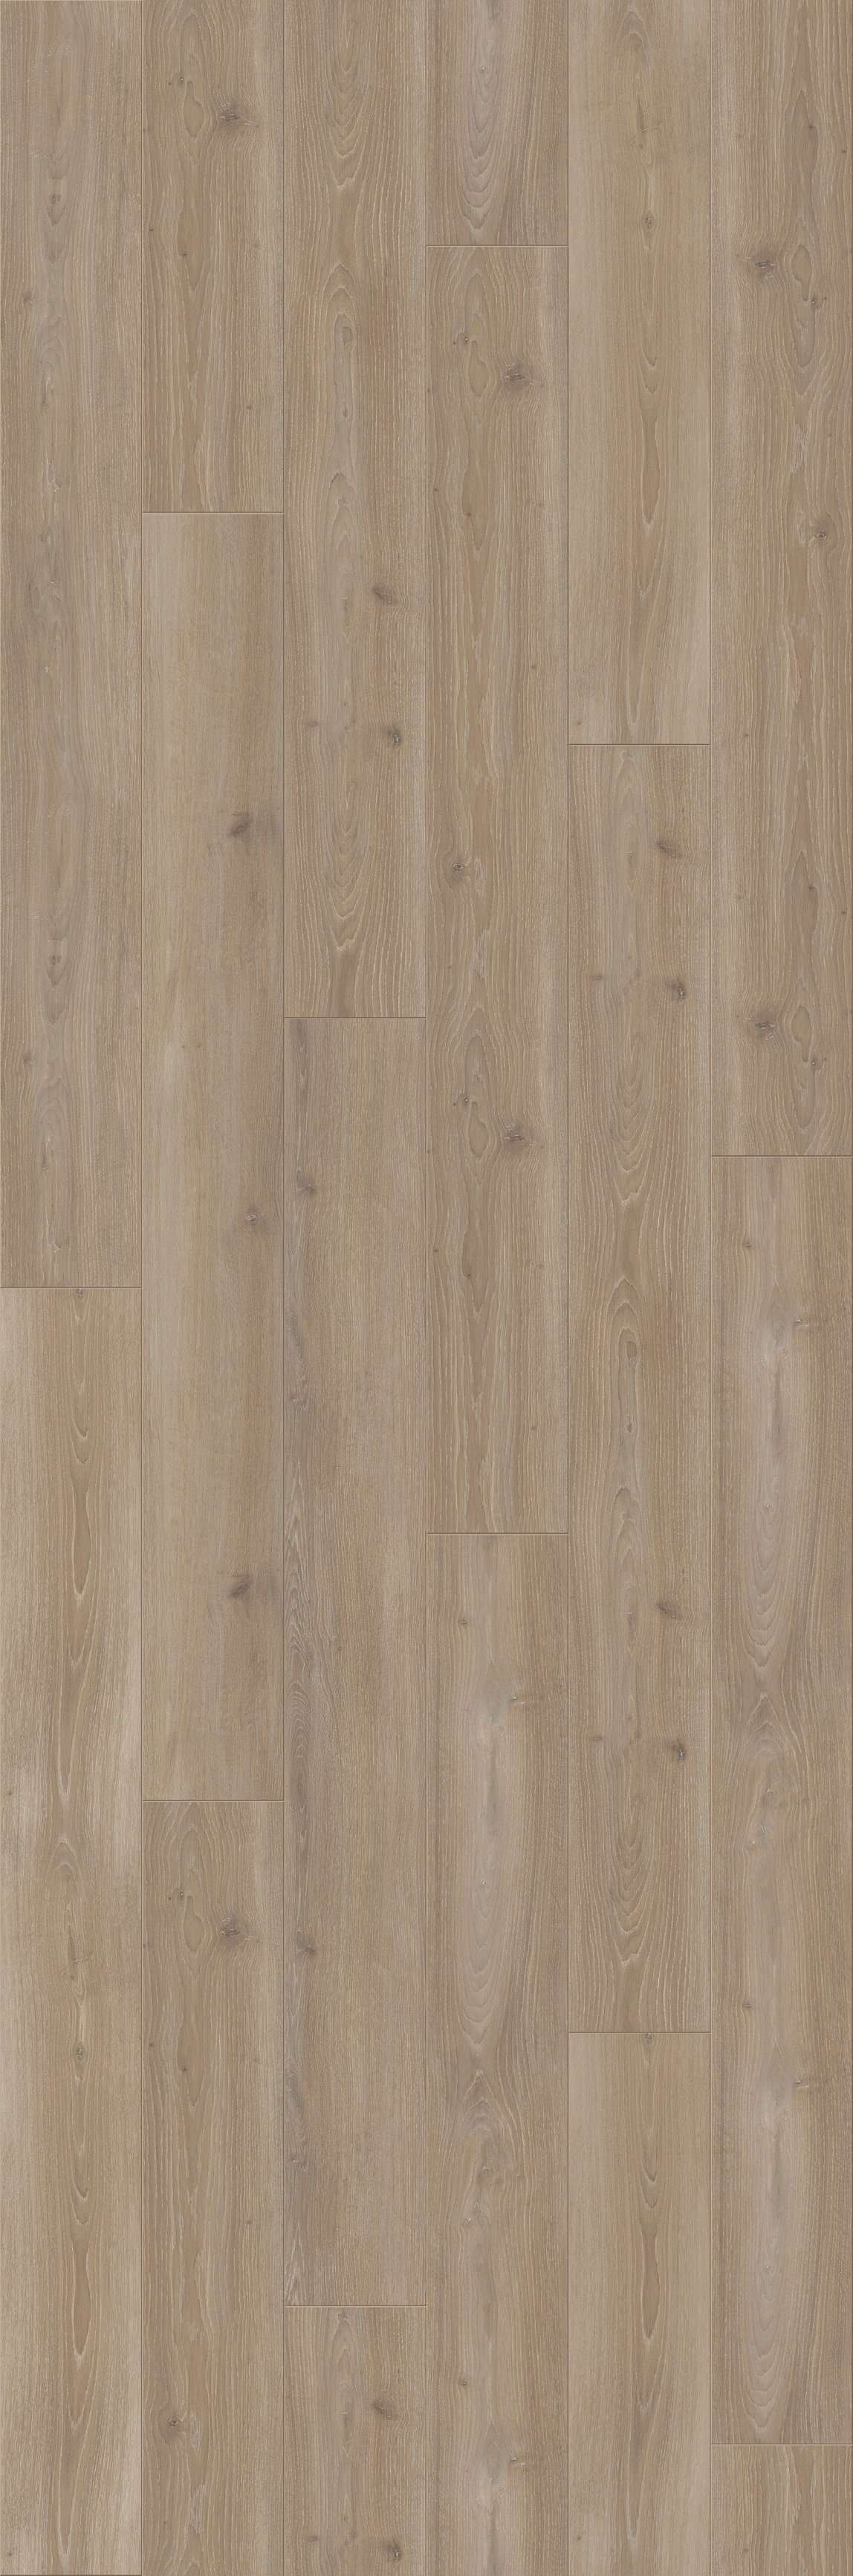 PARADOR Laminat »Trendtime 6 - Eiche Skyline perlgrau«, 2200 x 243 mm, Stärke: 9 mm